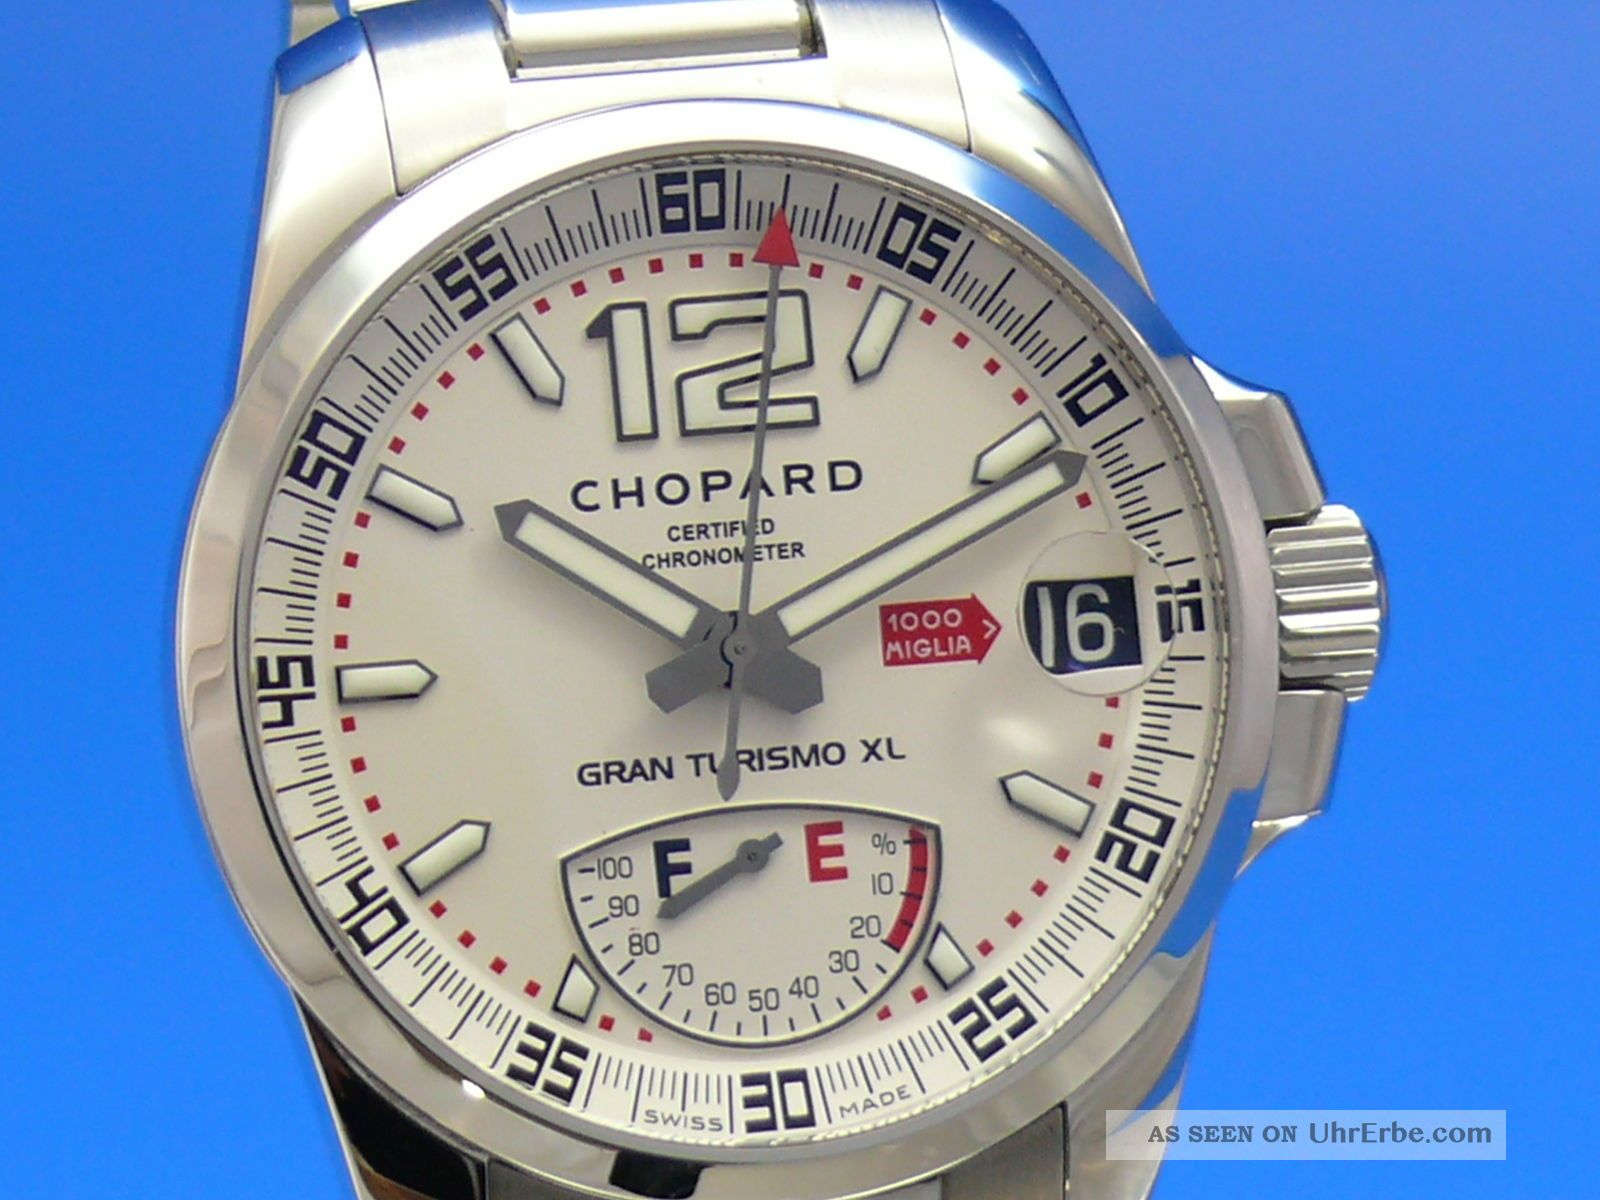 Chopard Mille Miglia Gran Turismo Gt Xl Power Reserve Uhrenankauf 03079014692 Armbanduhren Bild